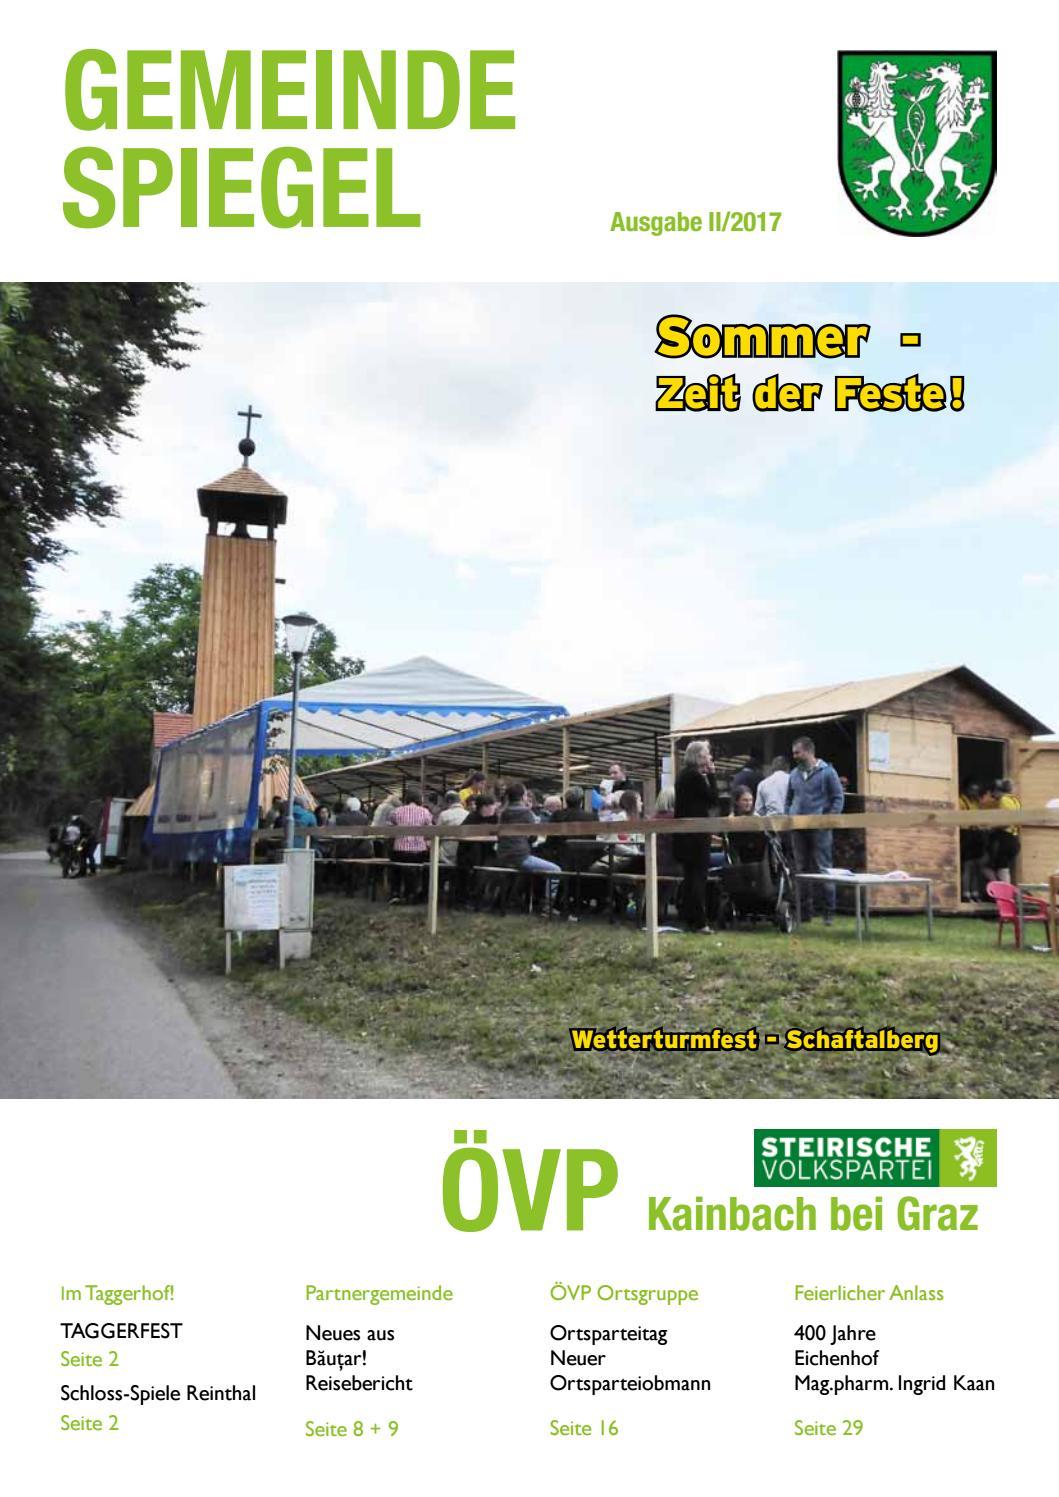 Kainbach bei Graz in Graz-Umgebung - Thema auf